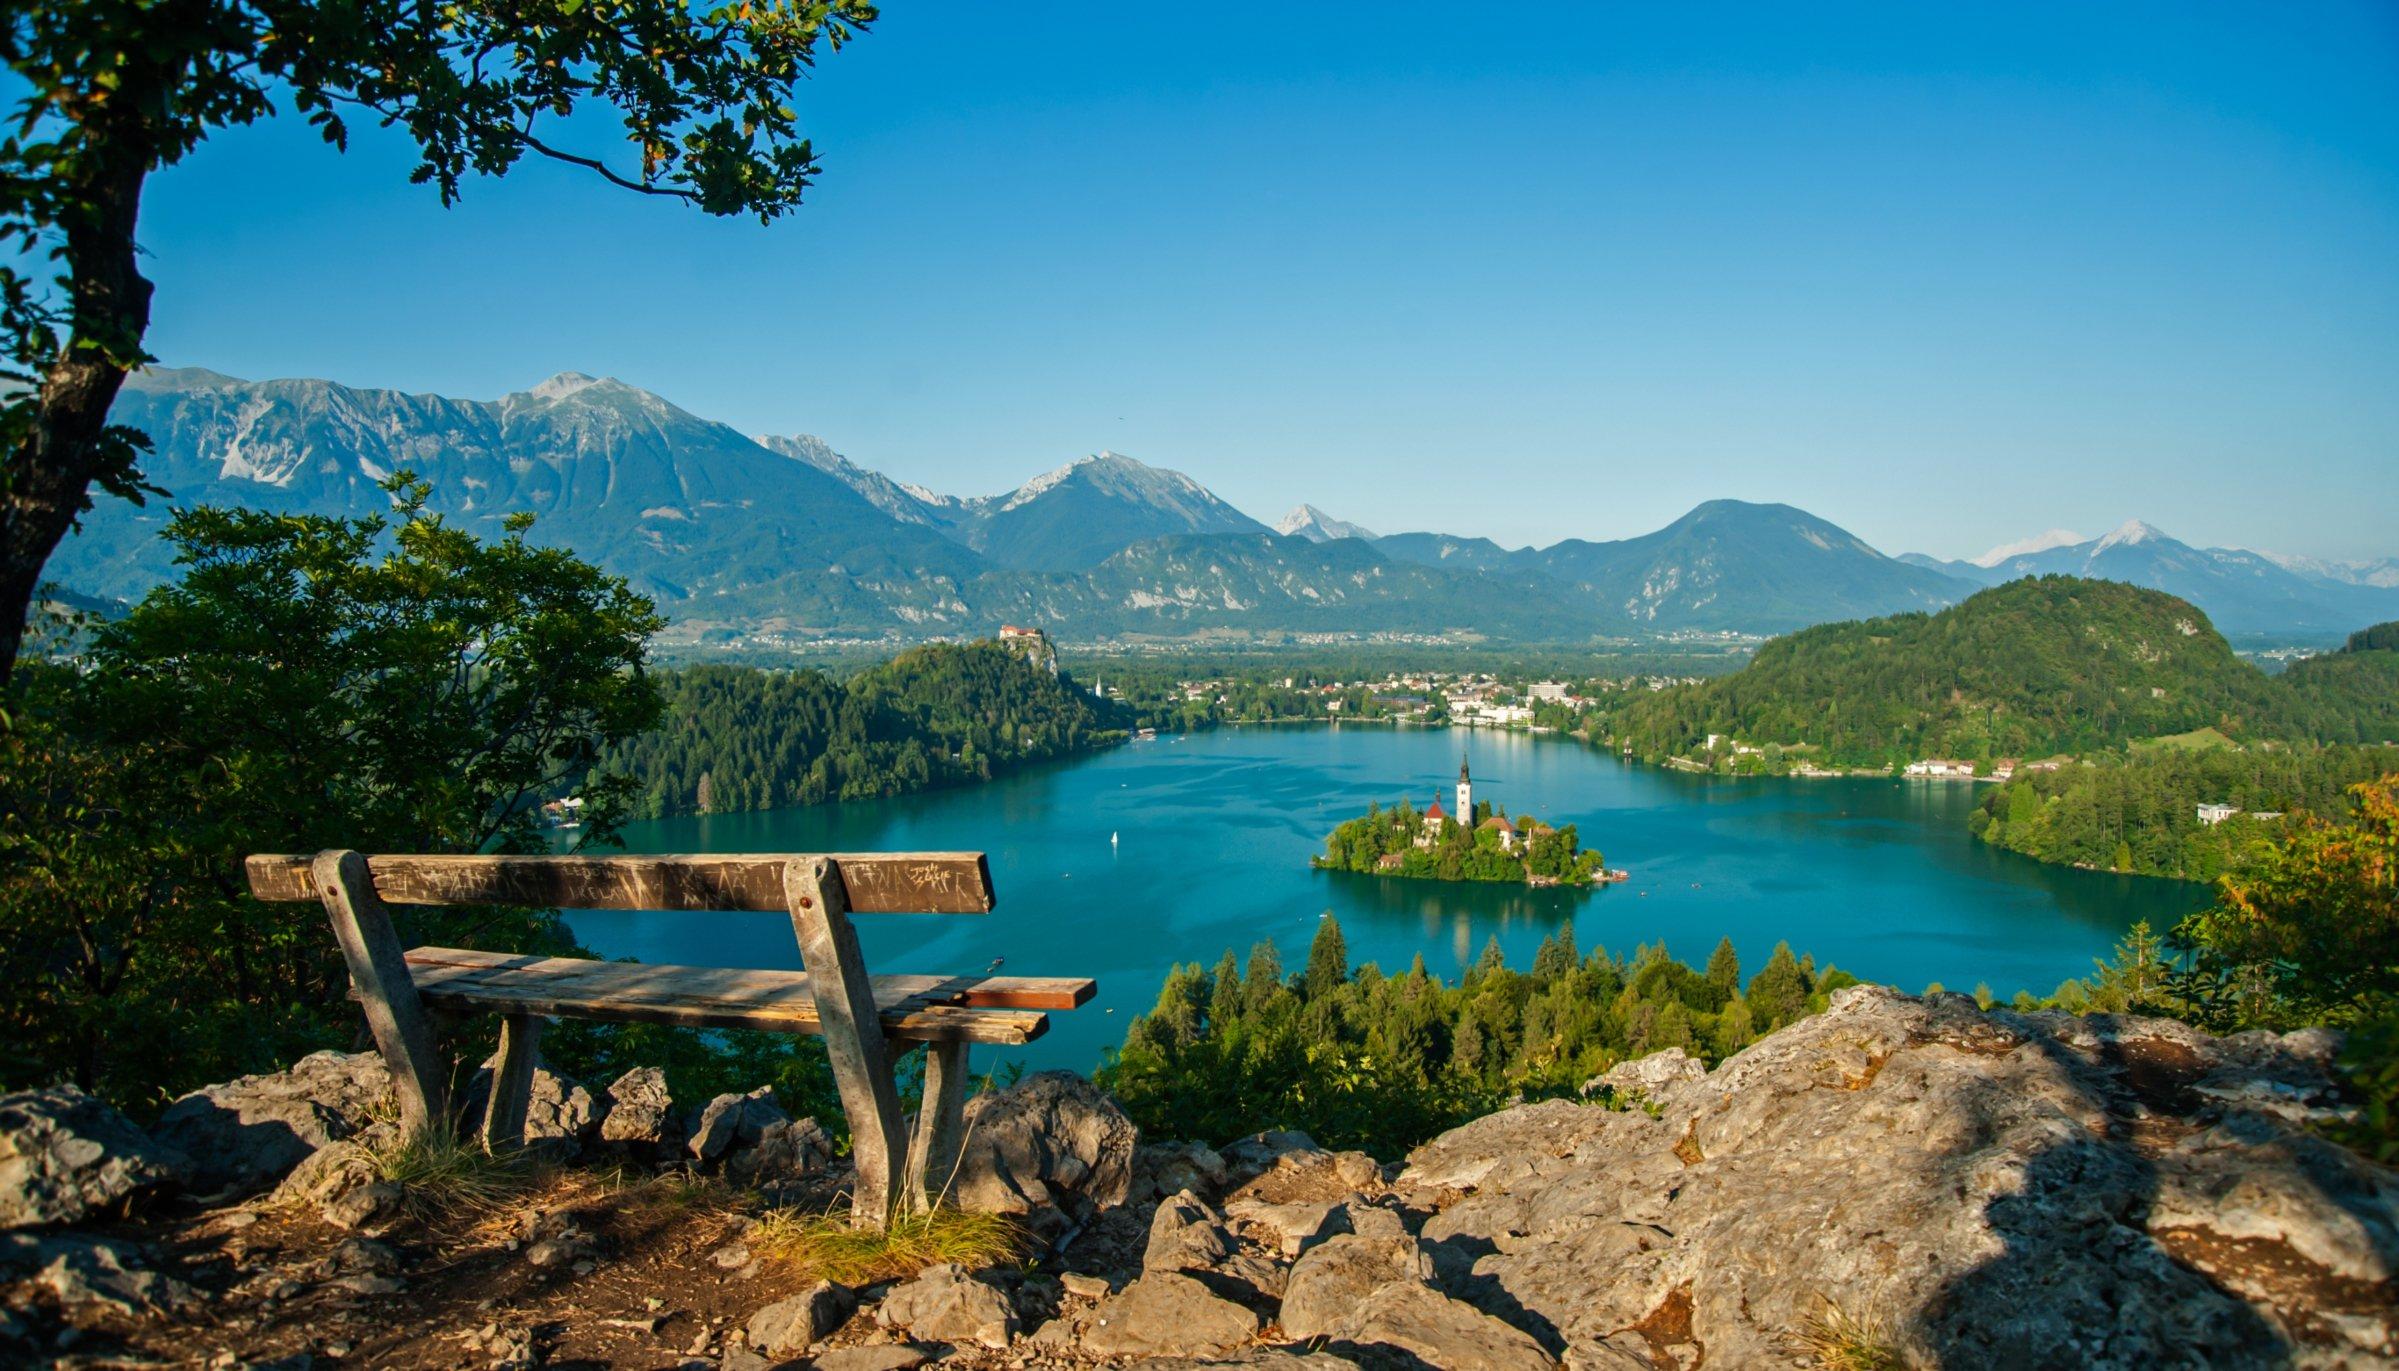 16-Day Grand Balkan Tour - Slovenia and North Macedonia Itinerary